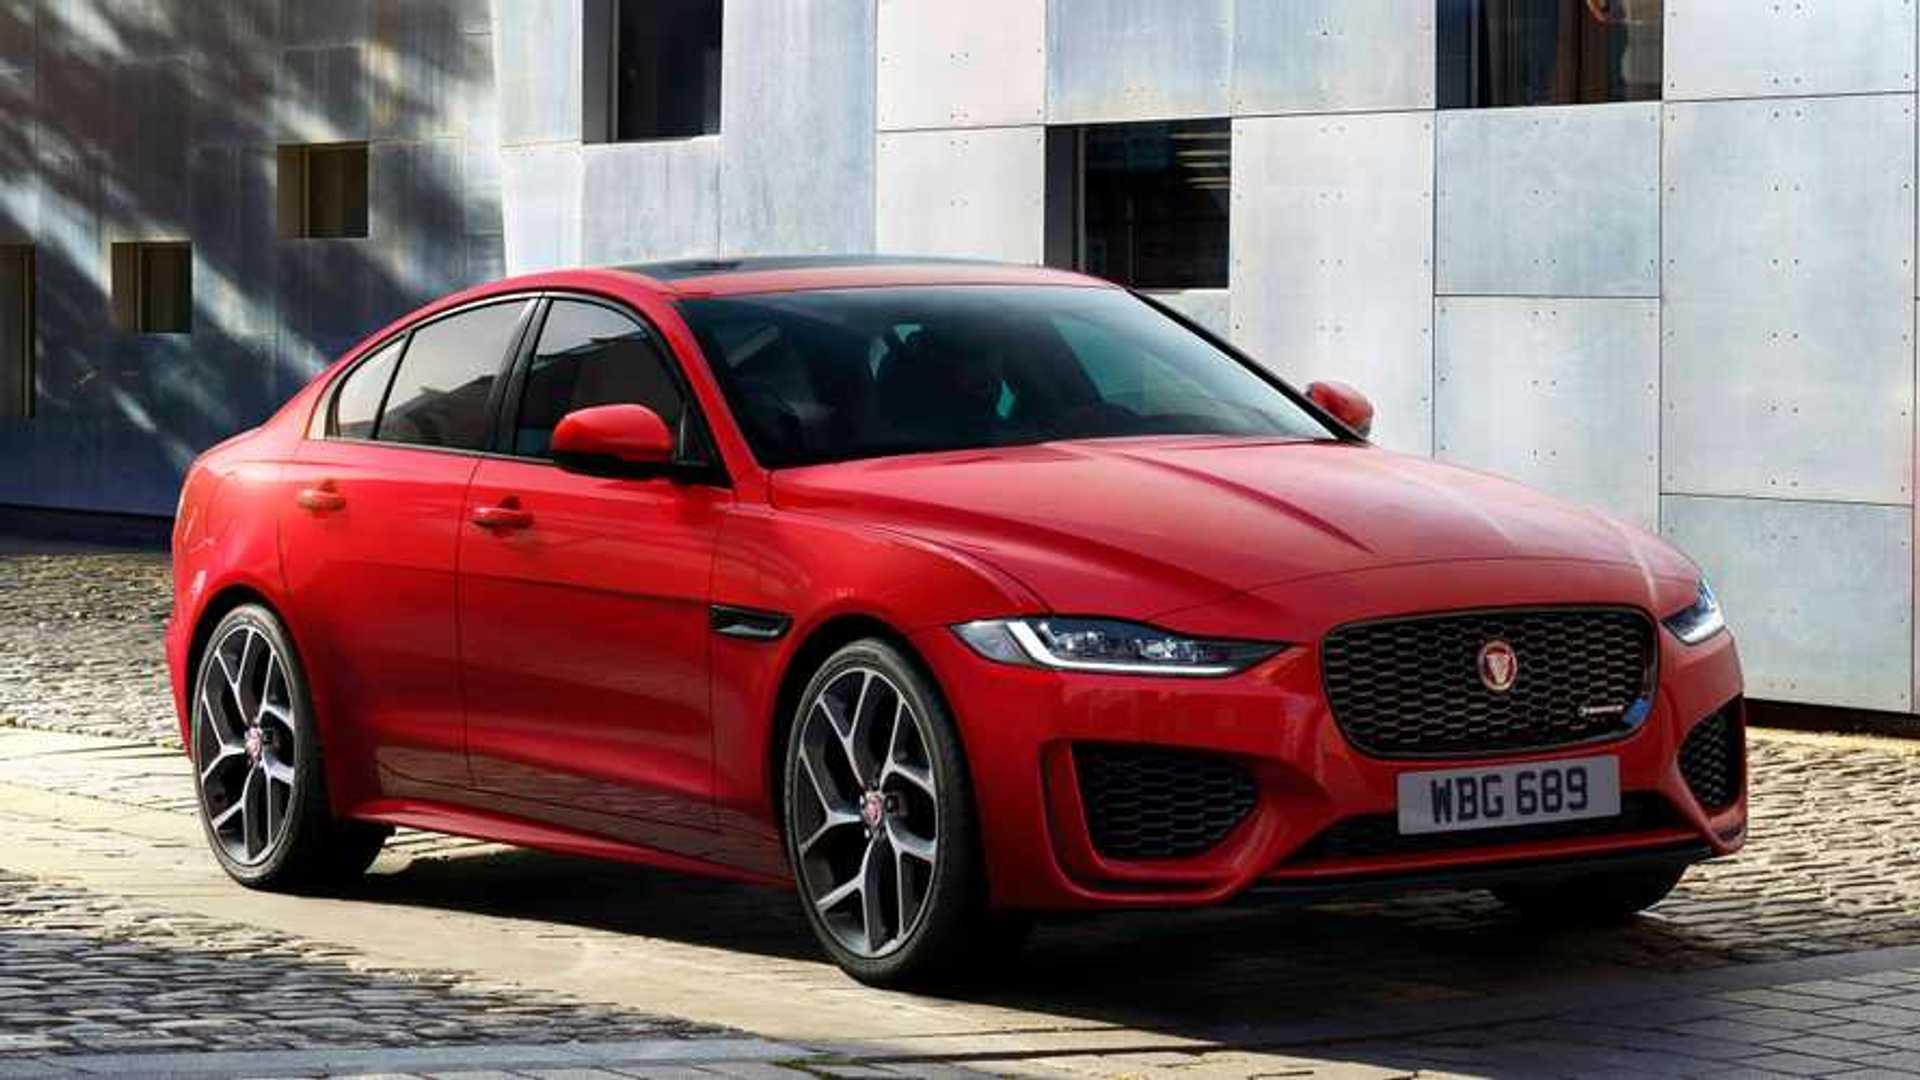 2020 Jaguar XE Redesign